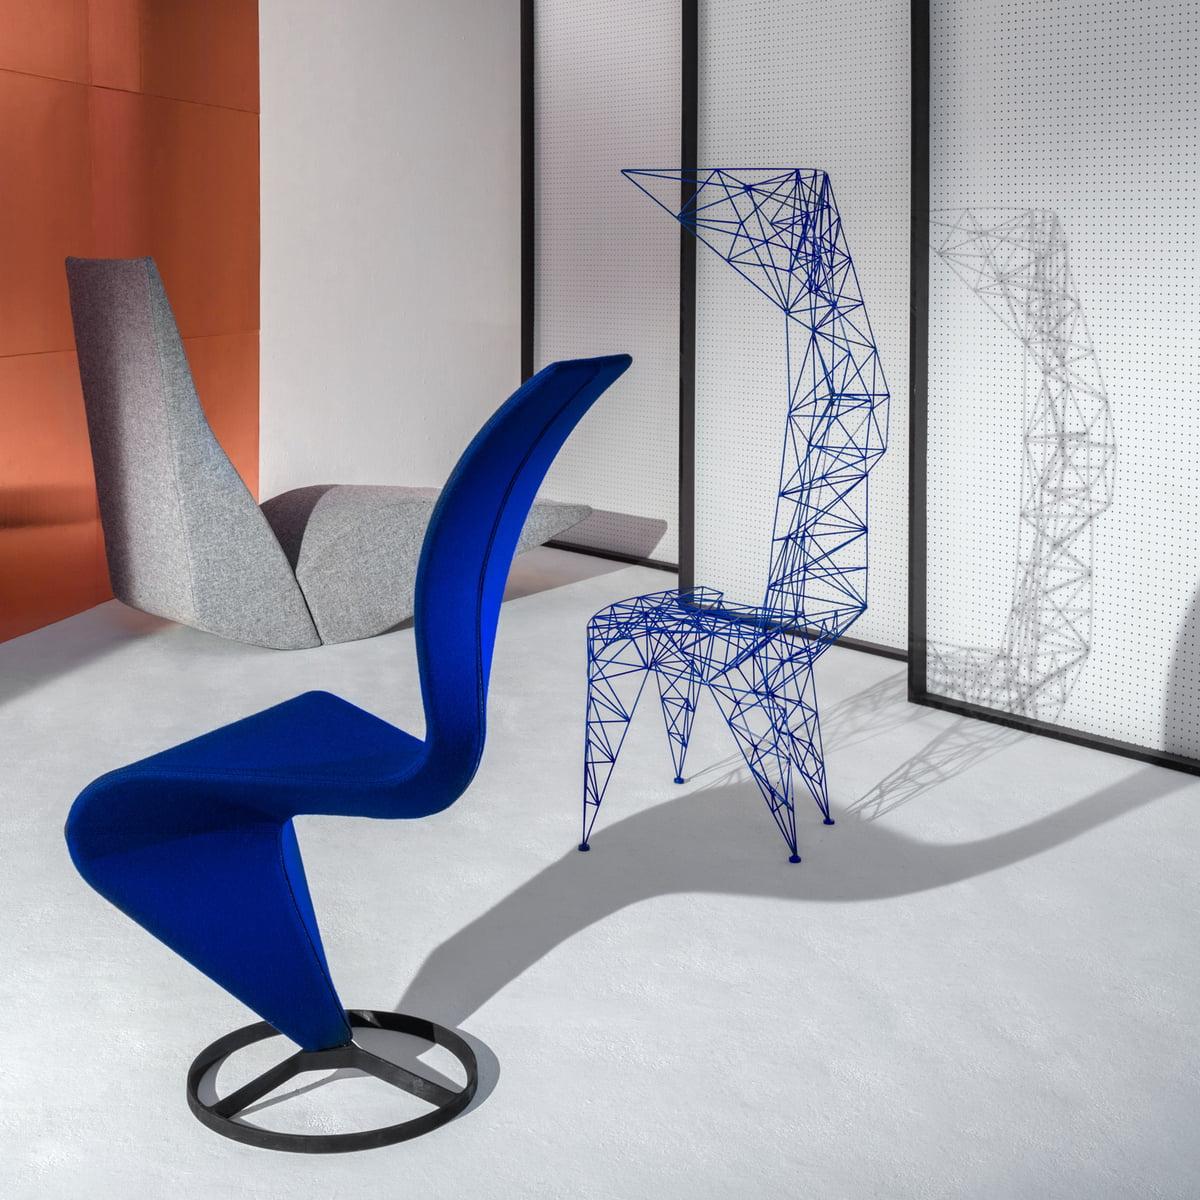 pylon stuhl von tom dixon connox shop. Black Bedroom Furniture Sets. Home Design Ideas